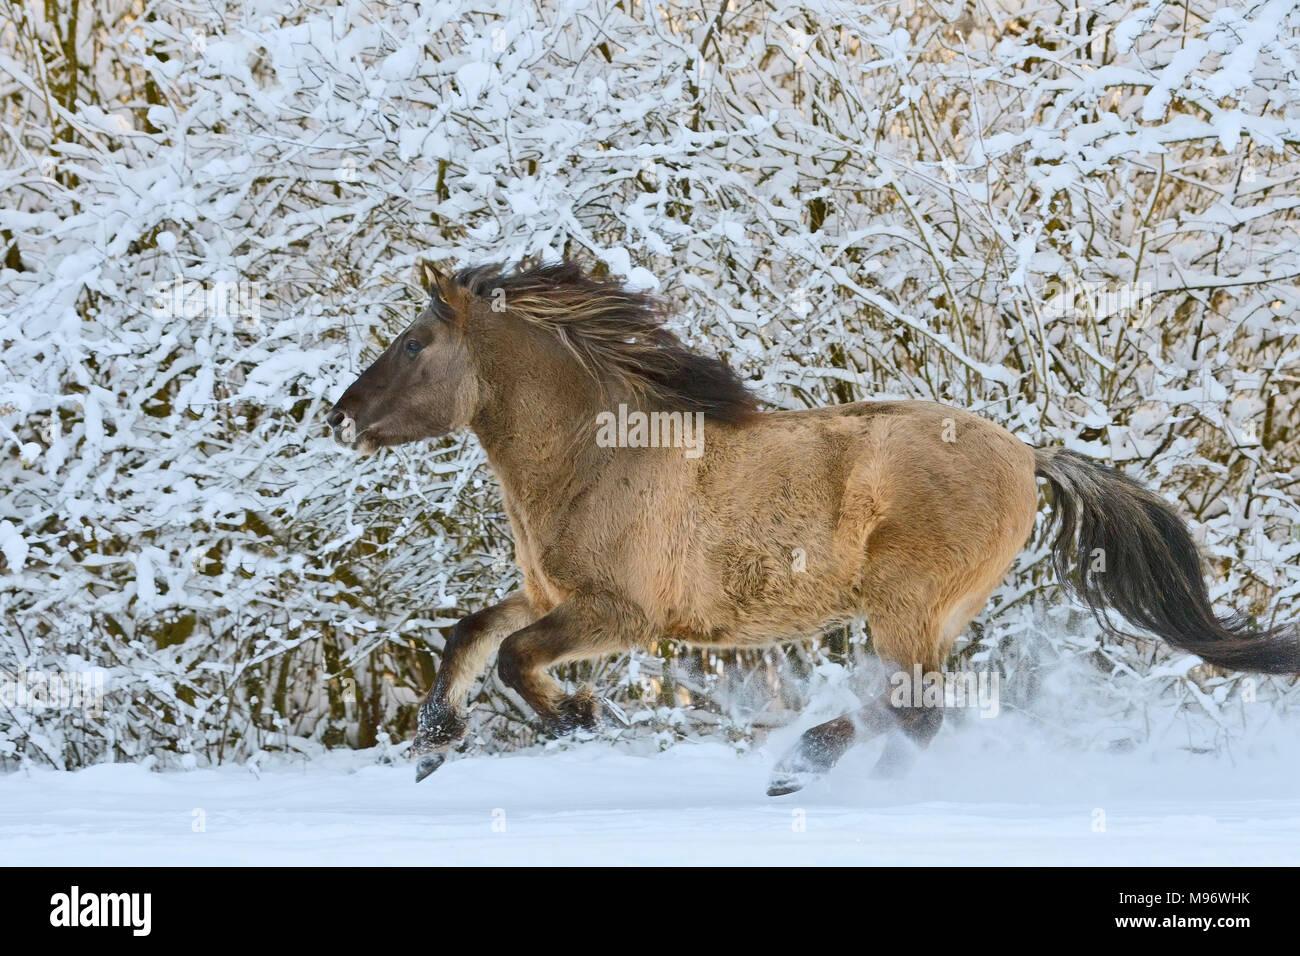 Konik pony cantering in snow Stock Photo